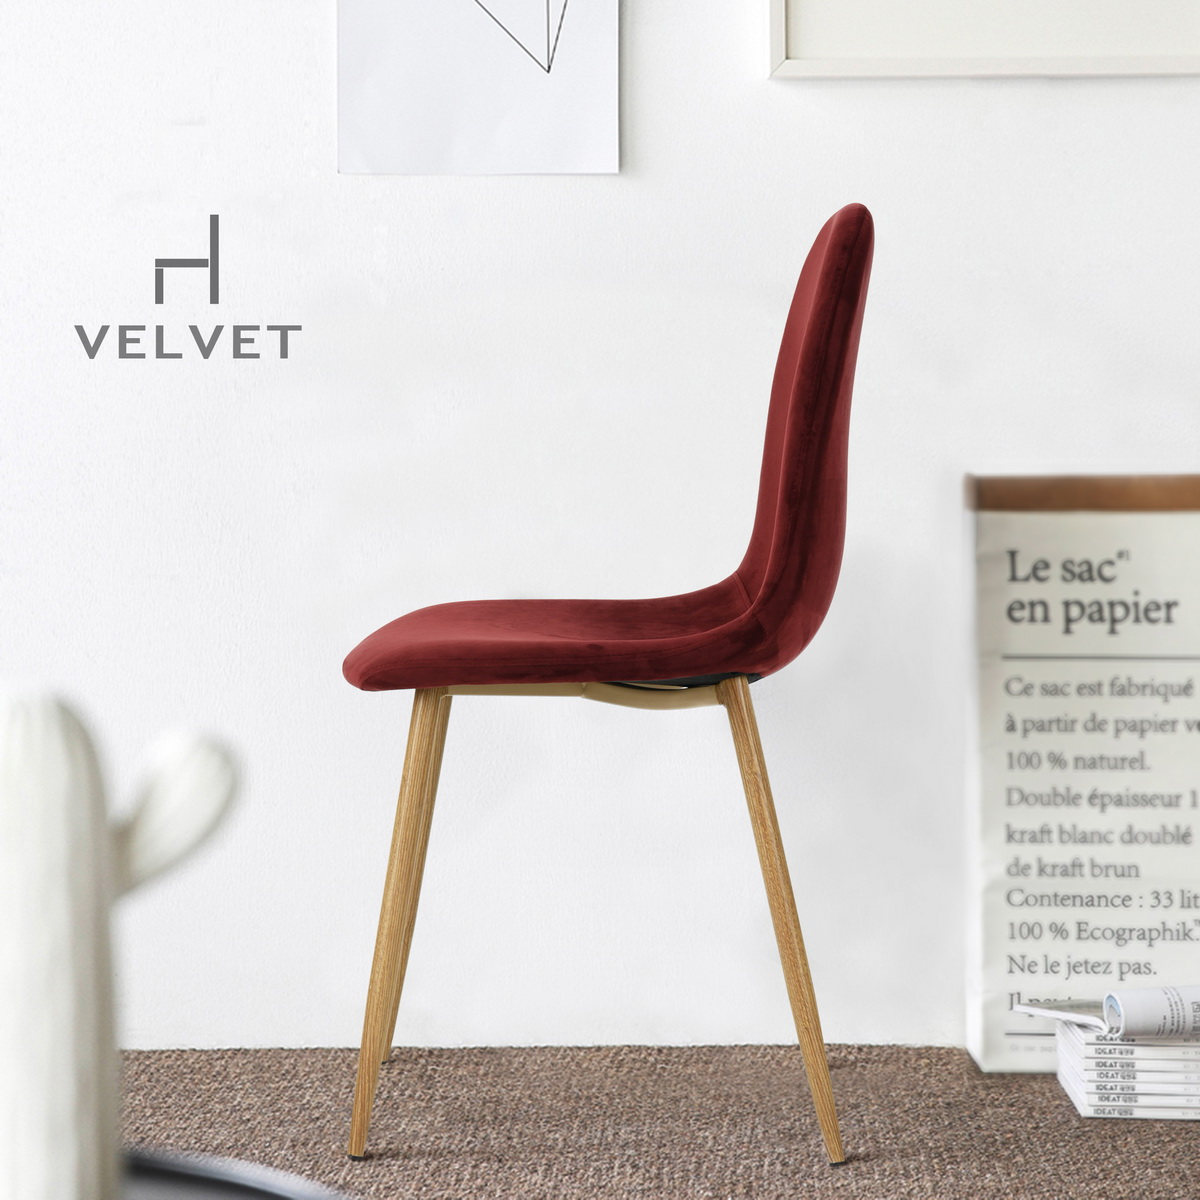 Set Of 4 Dining Chairs Scandinavian Retro Vintage Velvet Wine Red